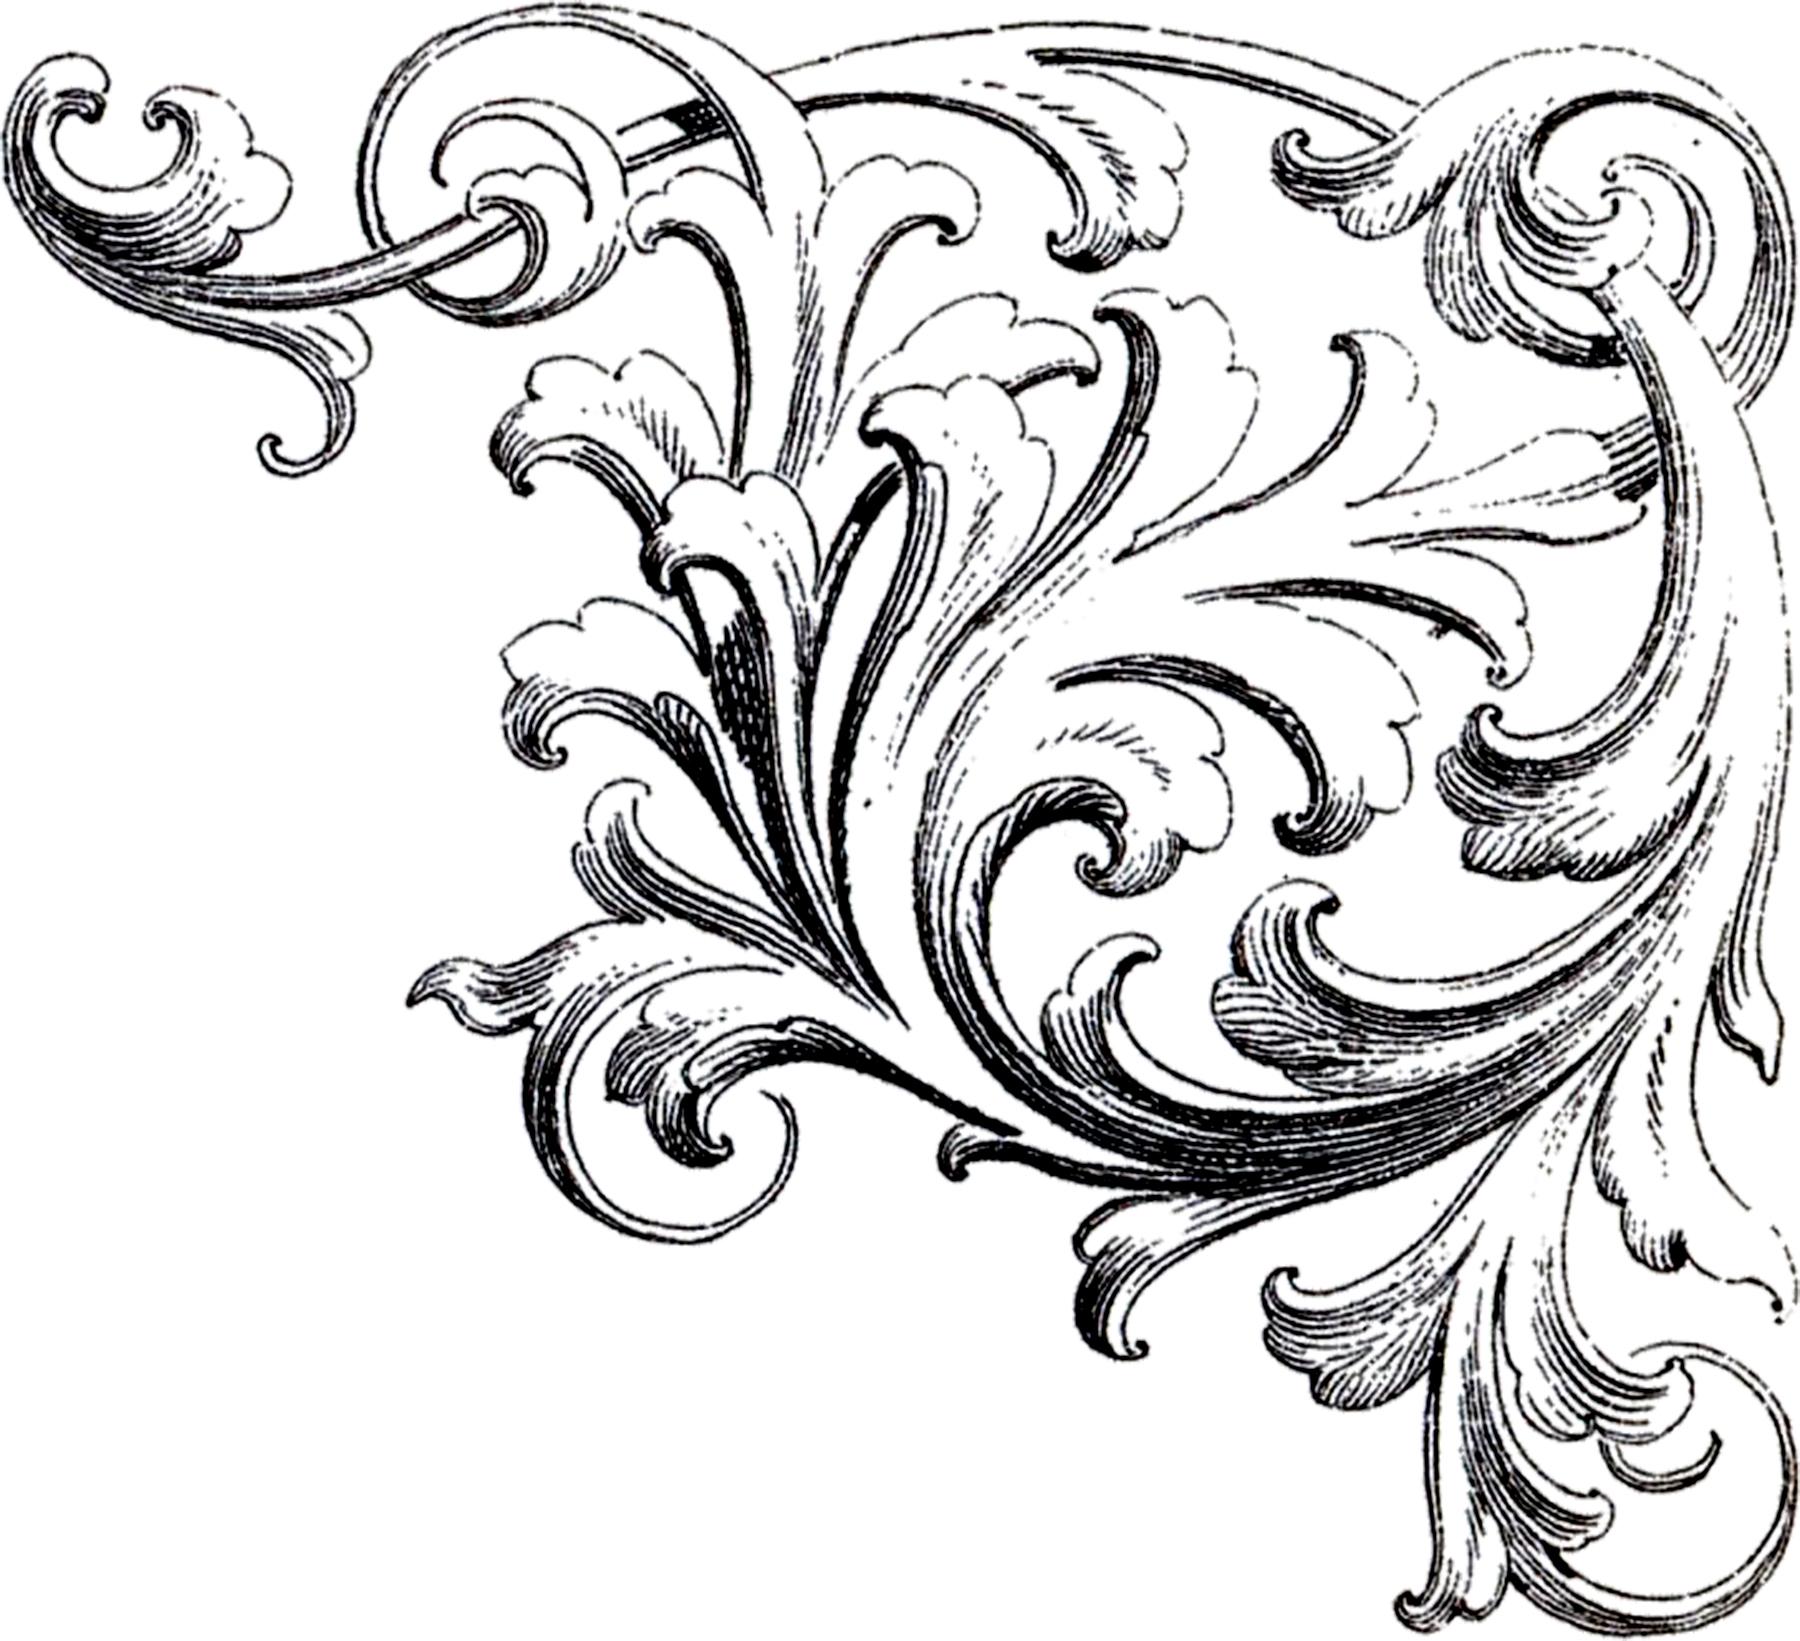 Italian ornaments - Scrolls Corner Ornament 2 Graphicsfairy